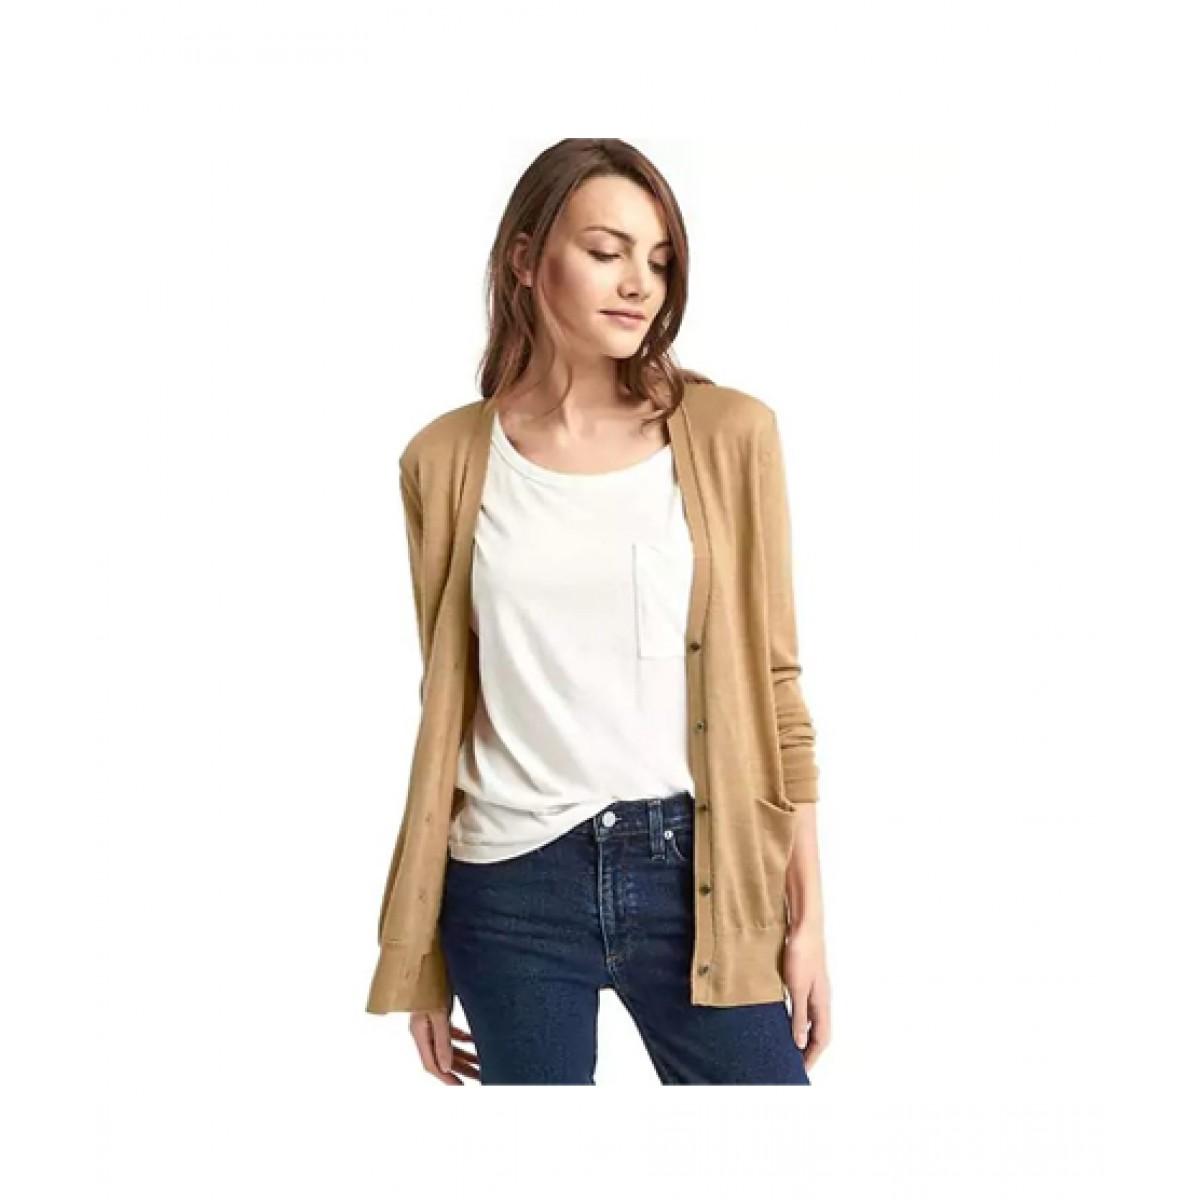 bada24188287fa Gap Wool Cardigan Women's Sweater Price in Pakistan   Buy Gap Merino Sweater  Camel   iShopping.pk